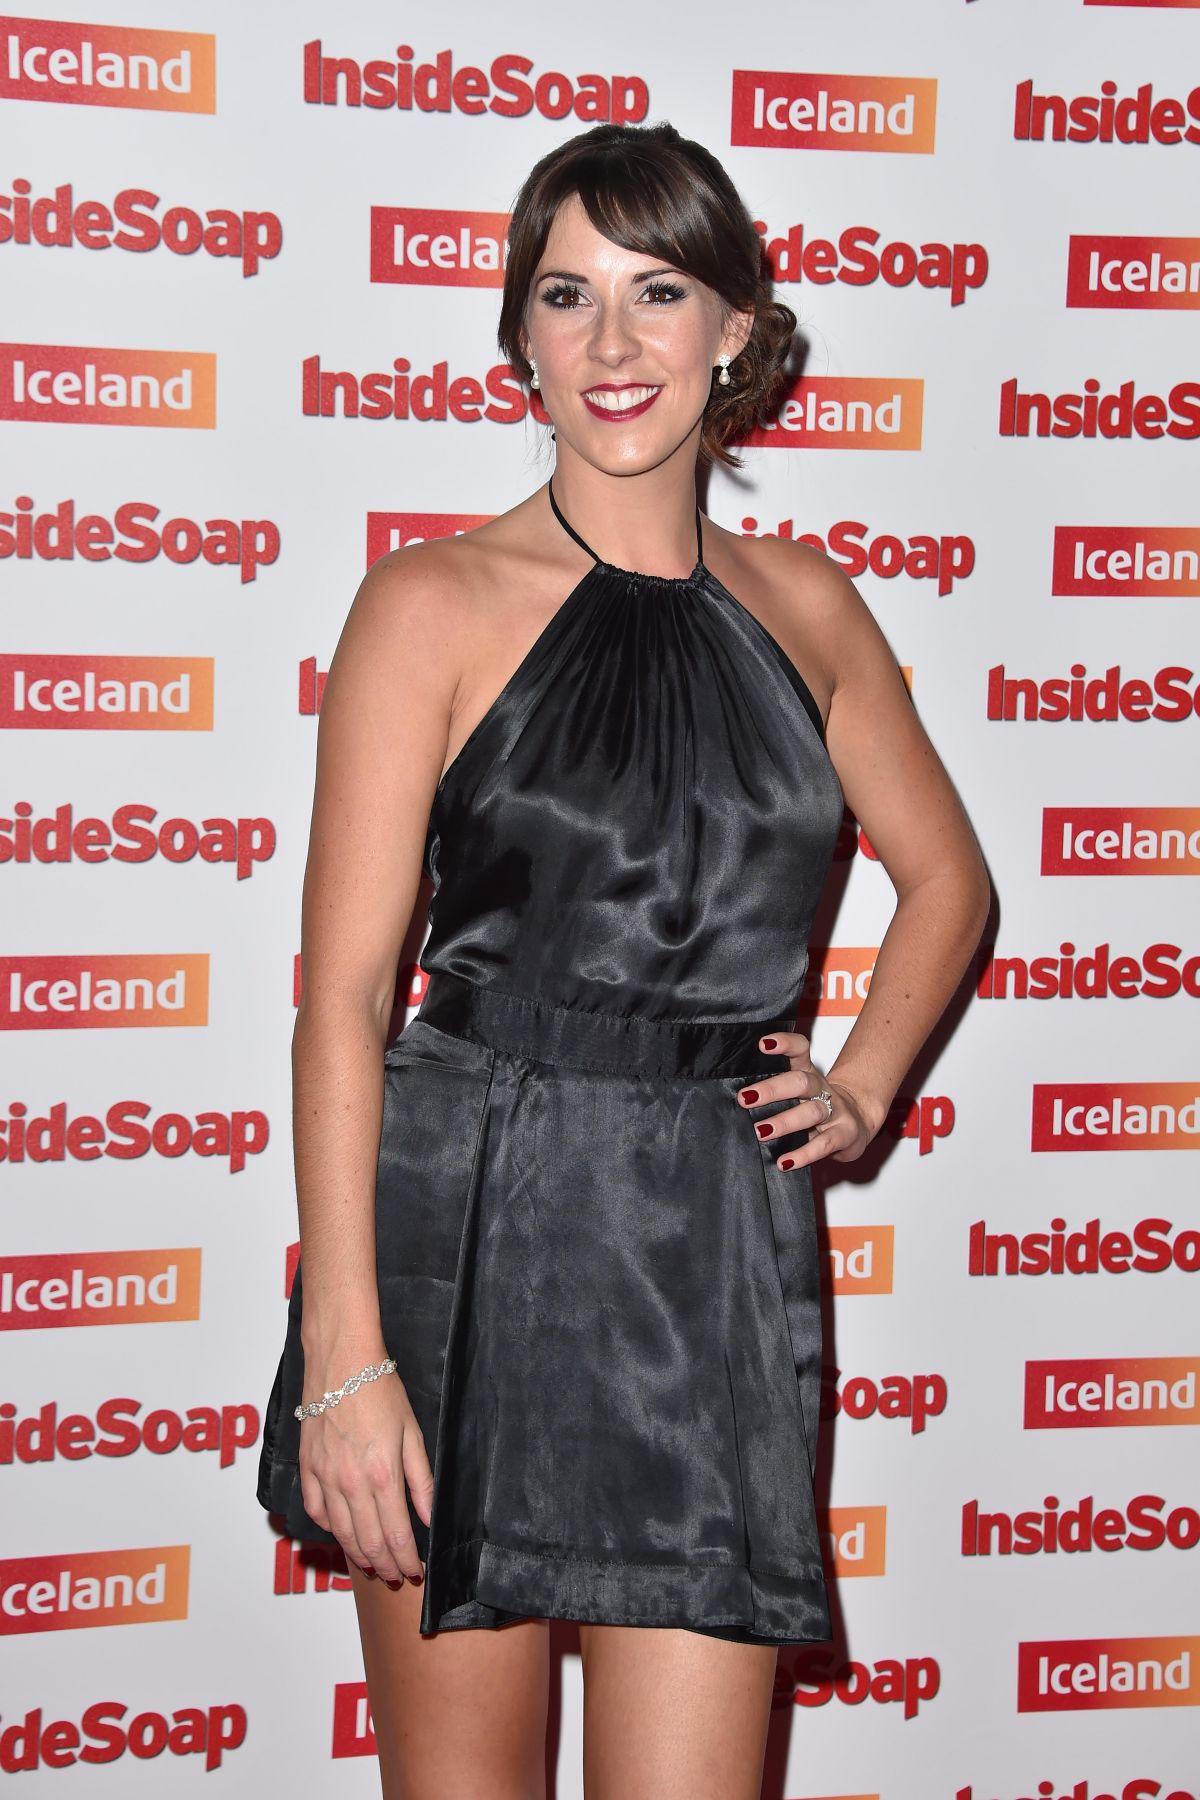 VERITY EUSHWORTH at Inside Soap Awards in London